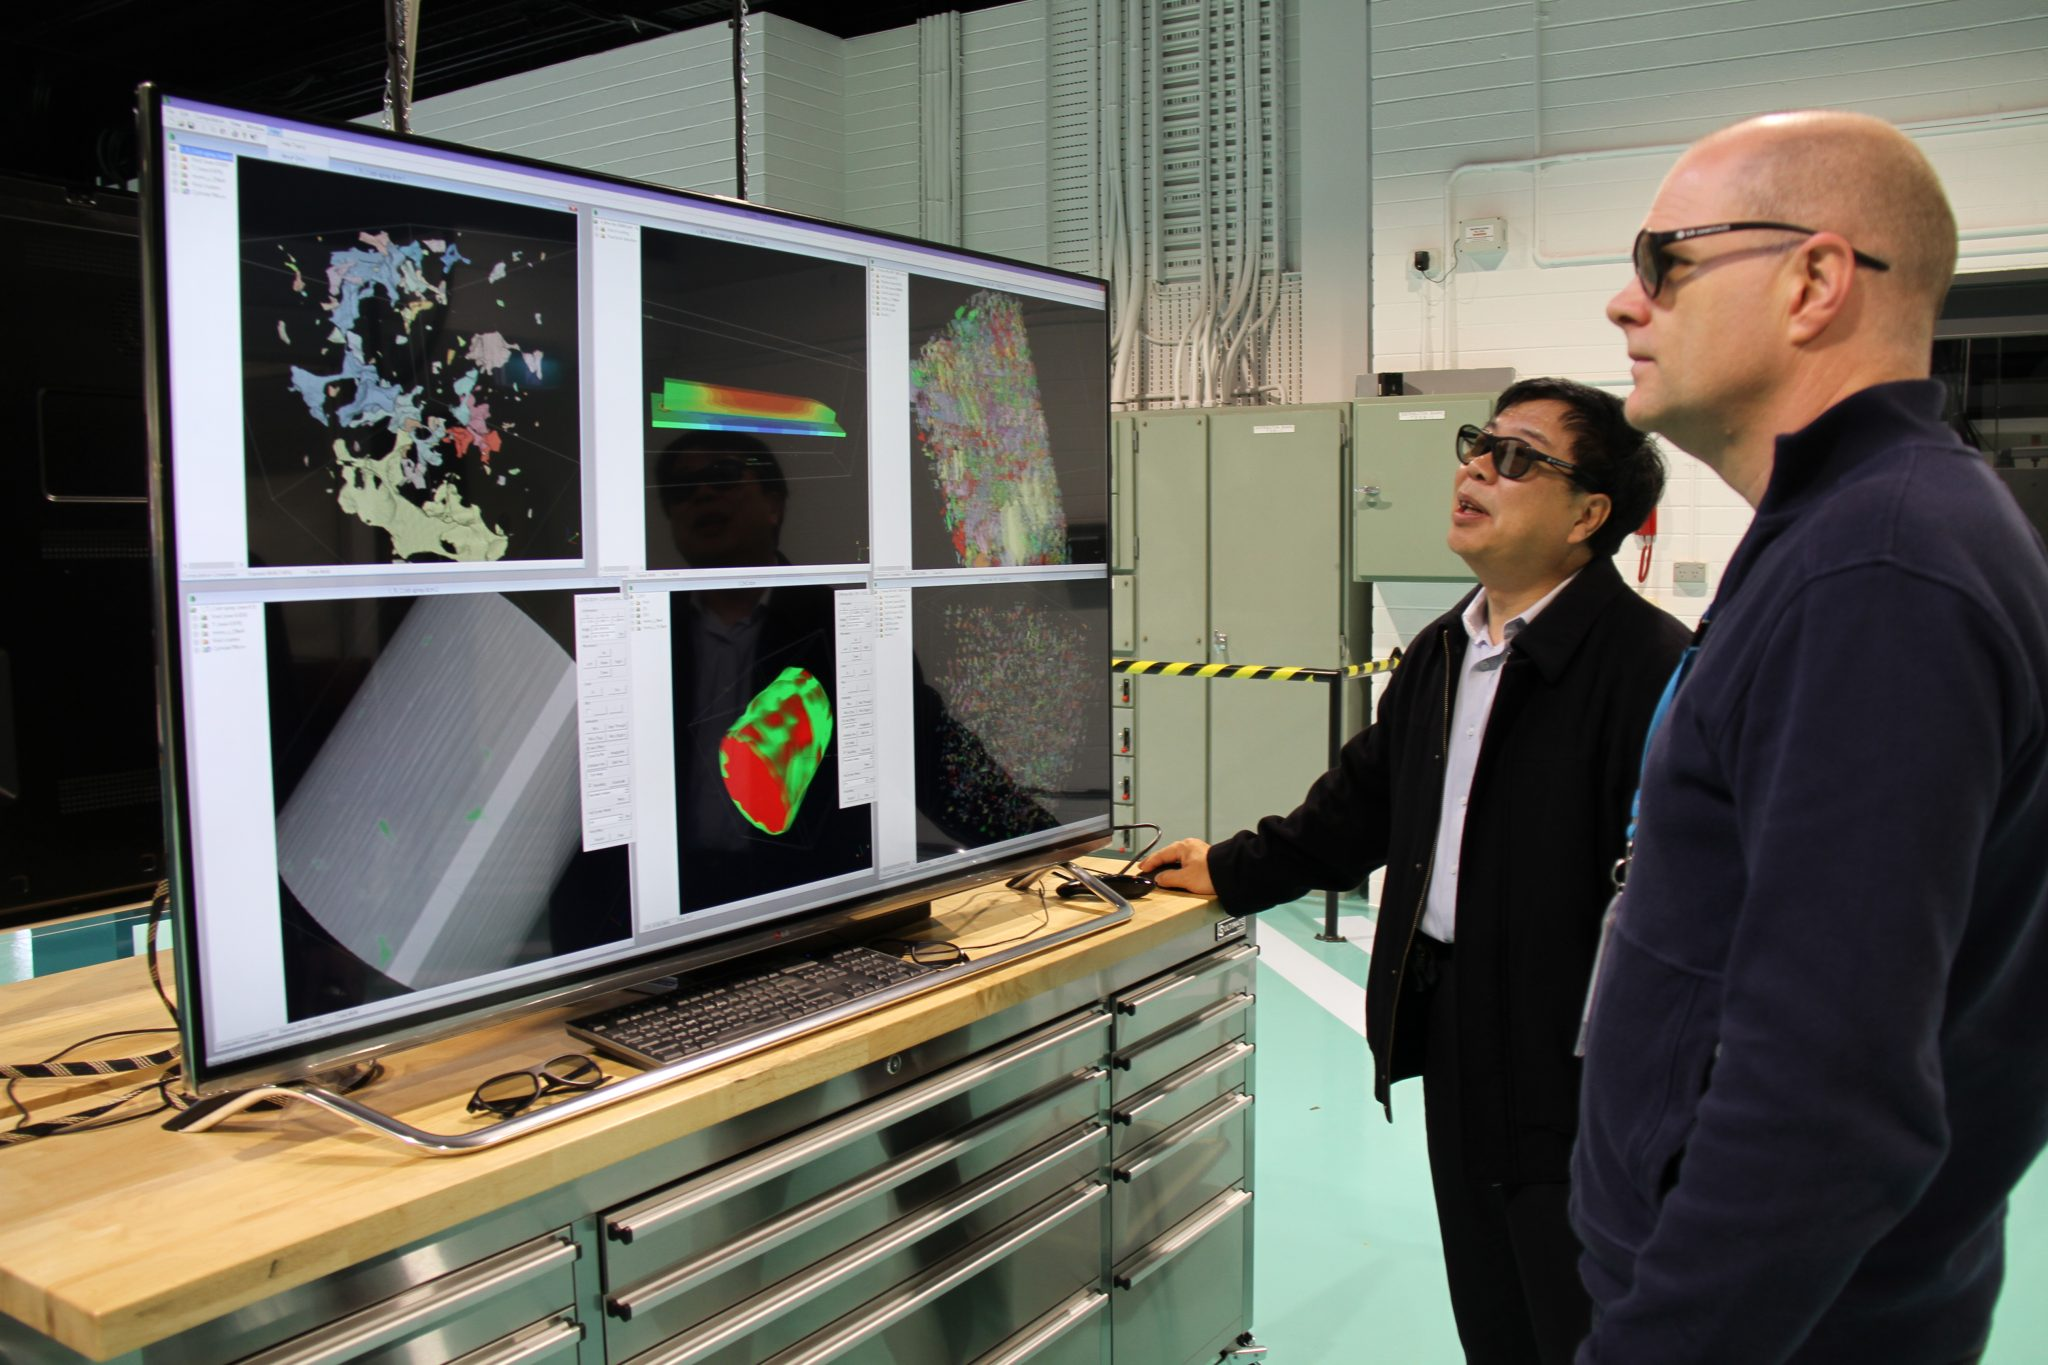 Analysis of 3D printed components at CSIRO's Lab 22. Photo via CSIRO.